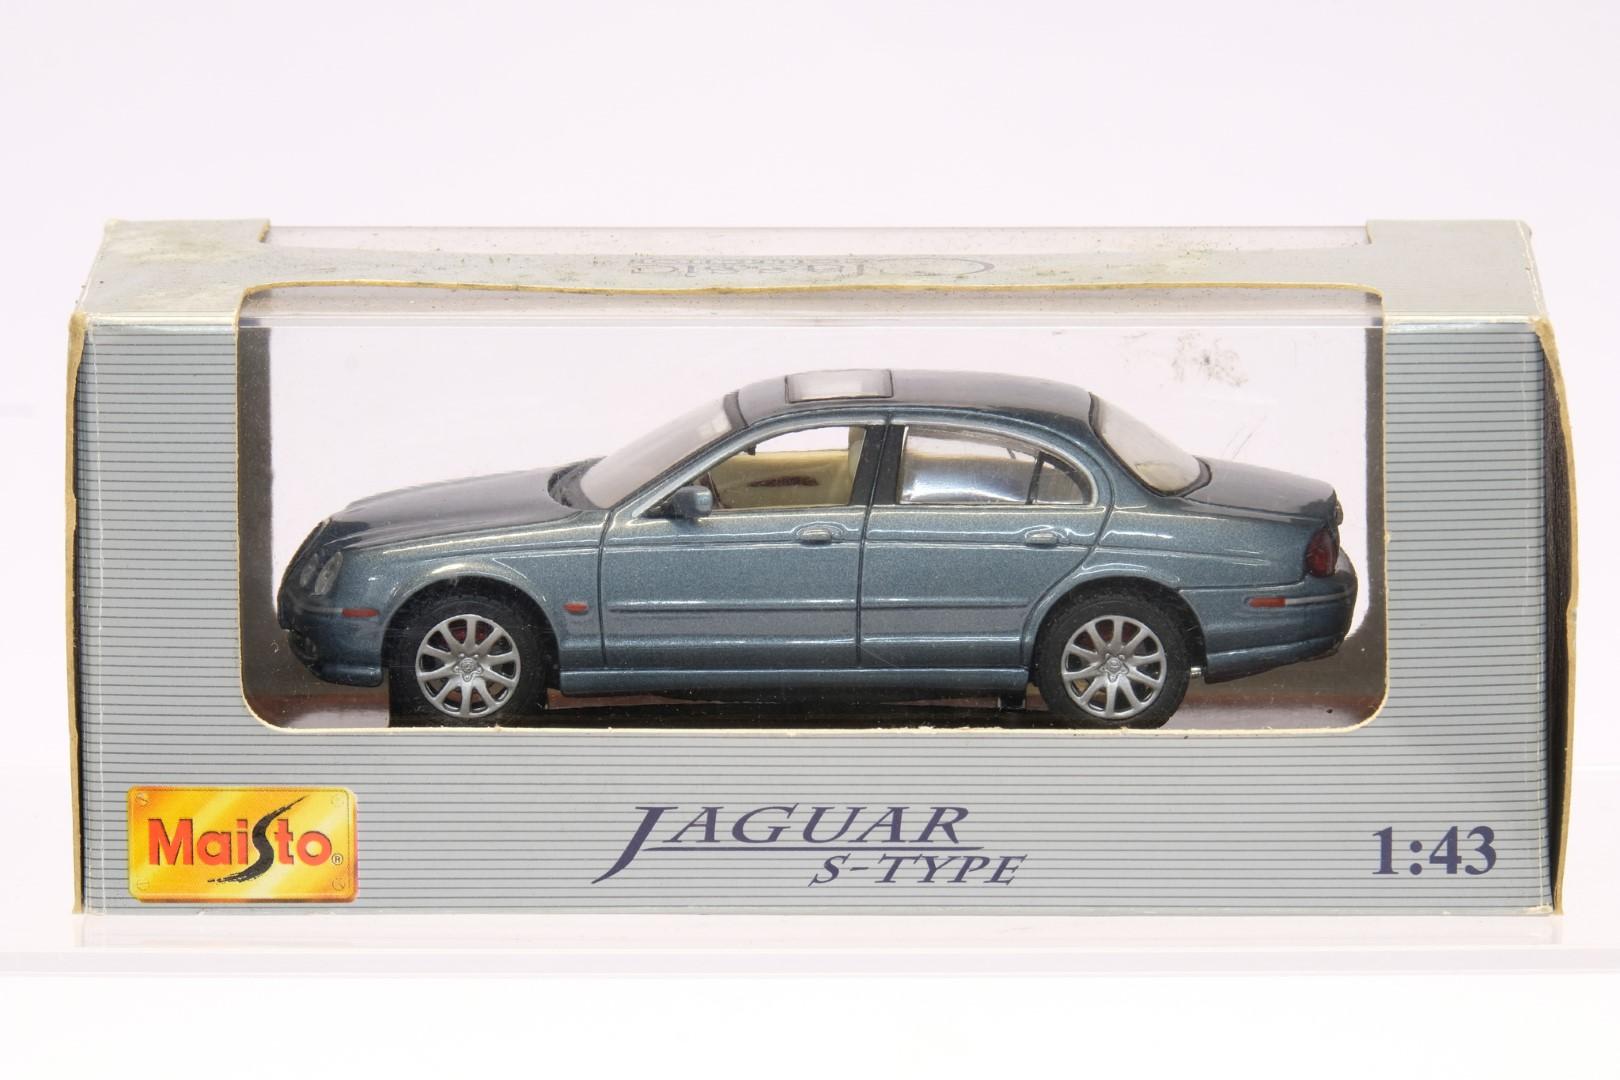 Maisto 3 Jaguar Models - Image 3 of 4